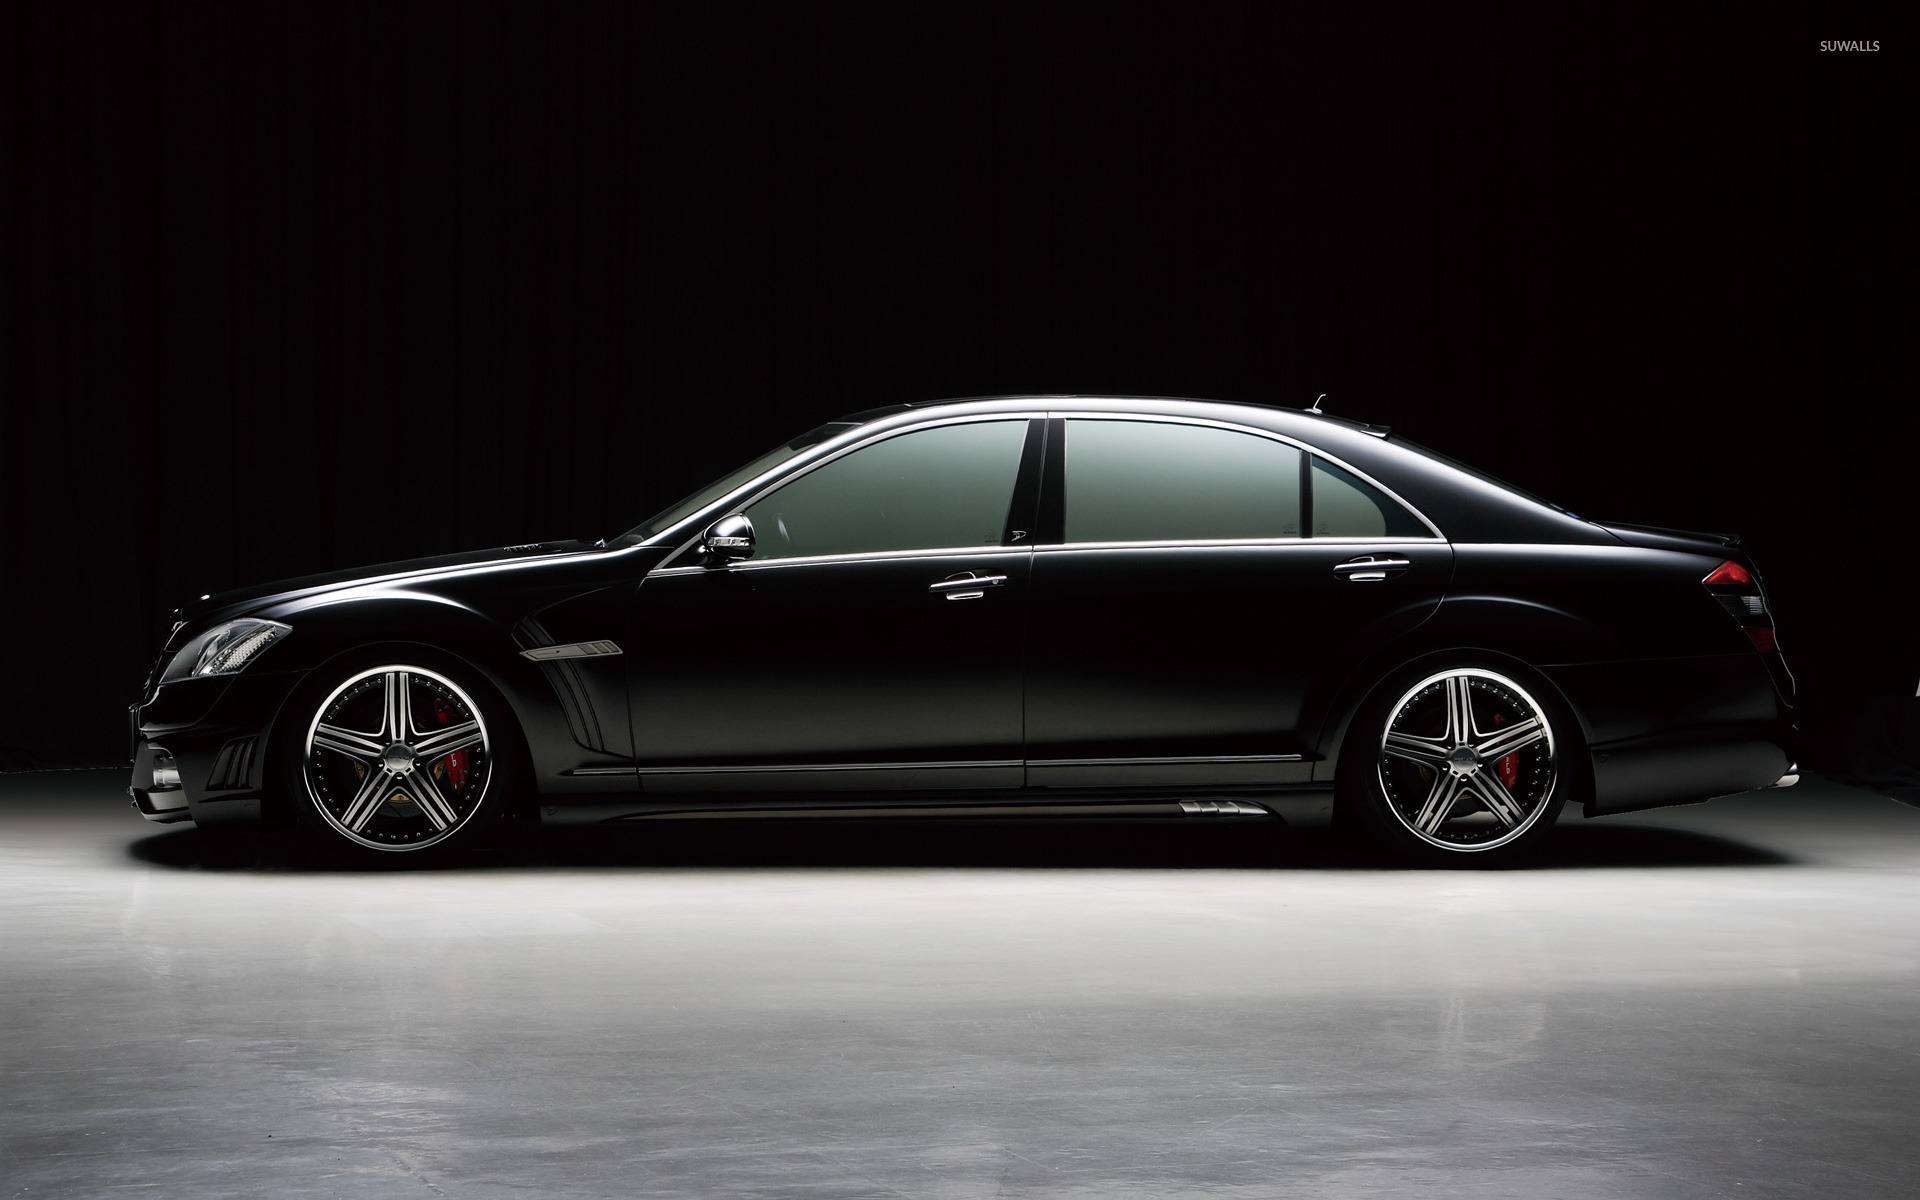 Mercedes benz s class black bison edition wallpaper car for Mercedes benz black edition